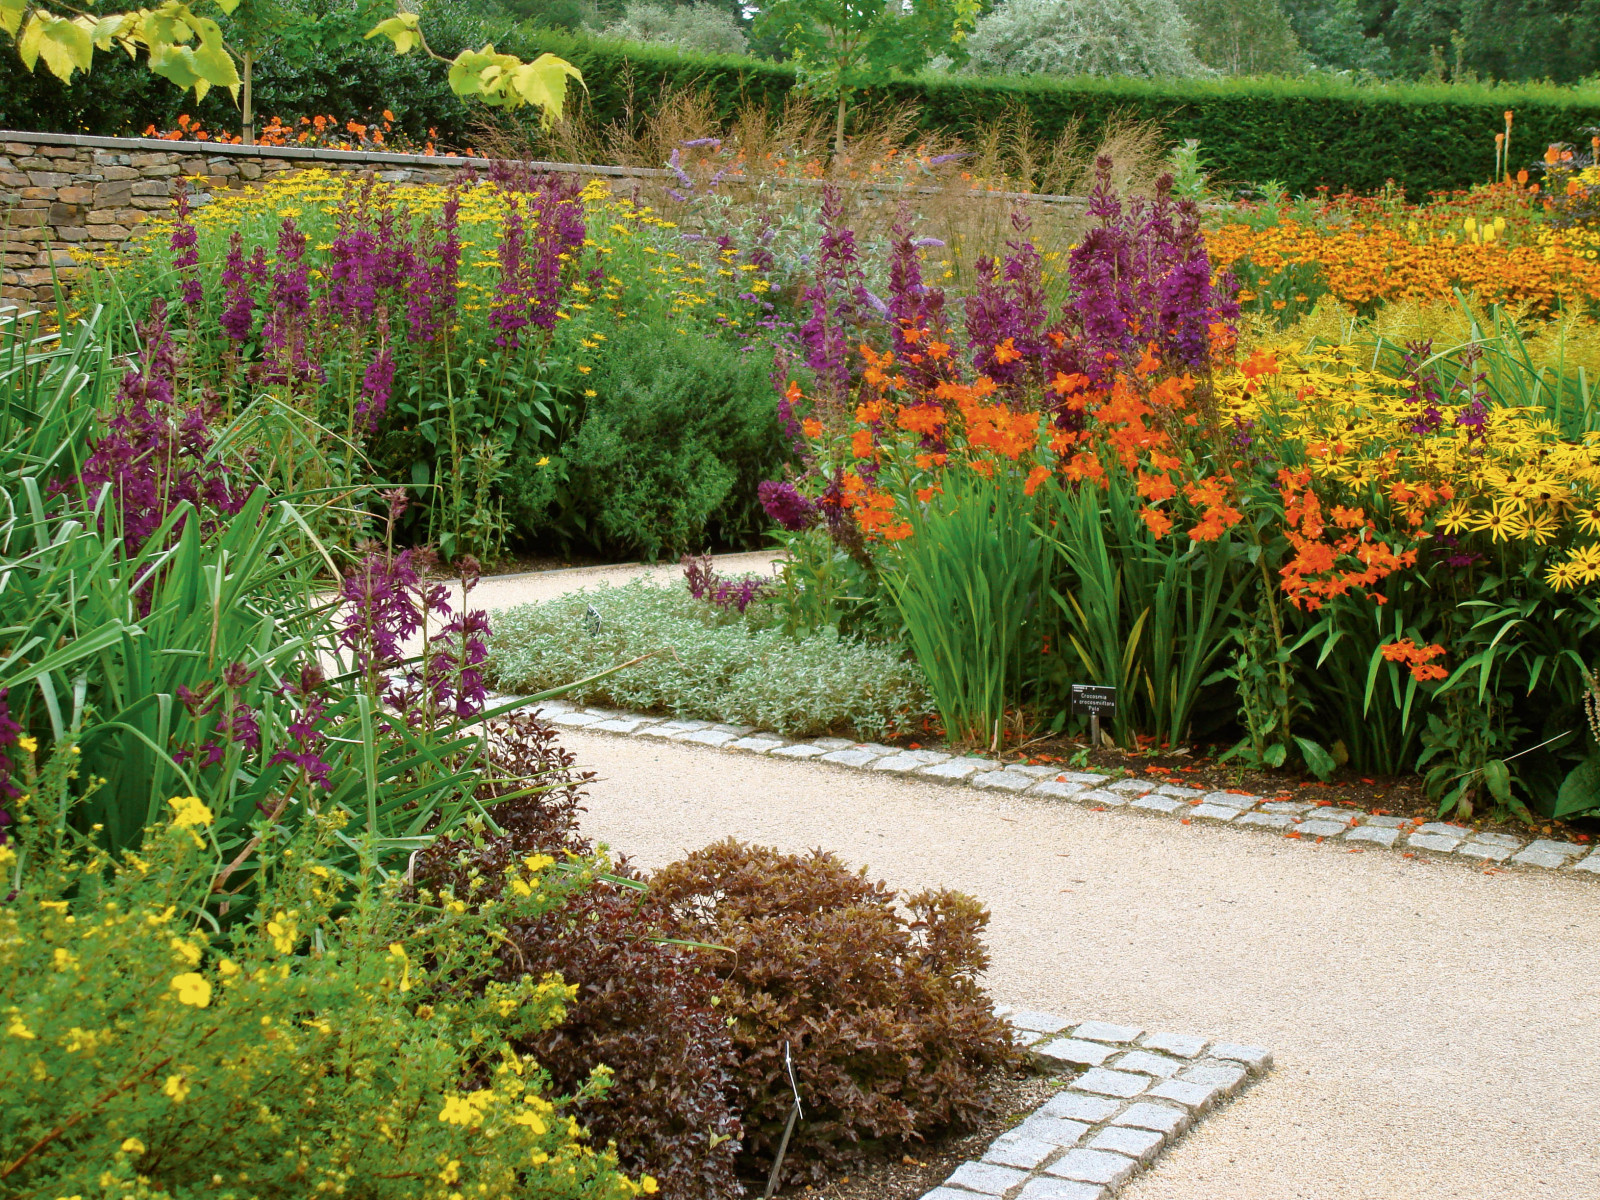 Gartendesign gartengestaltung callwey gartenbuch for Gartengestaltung wege